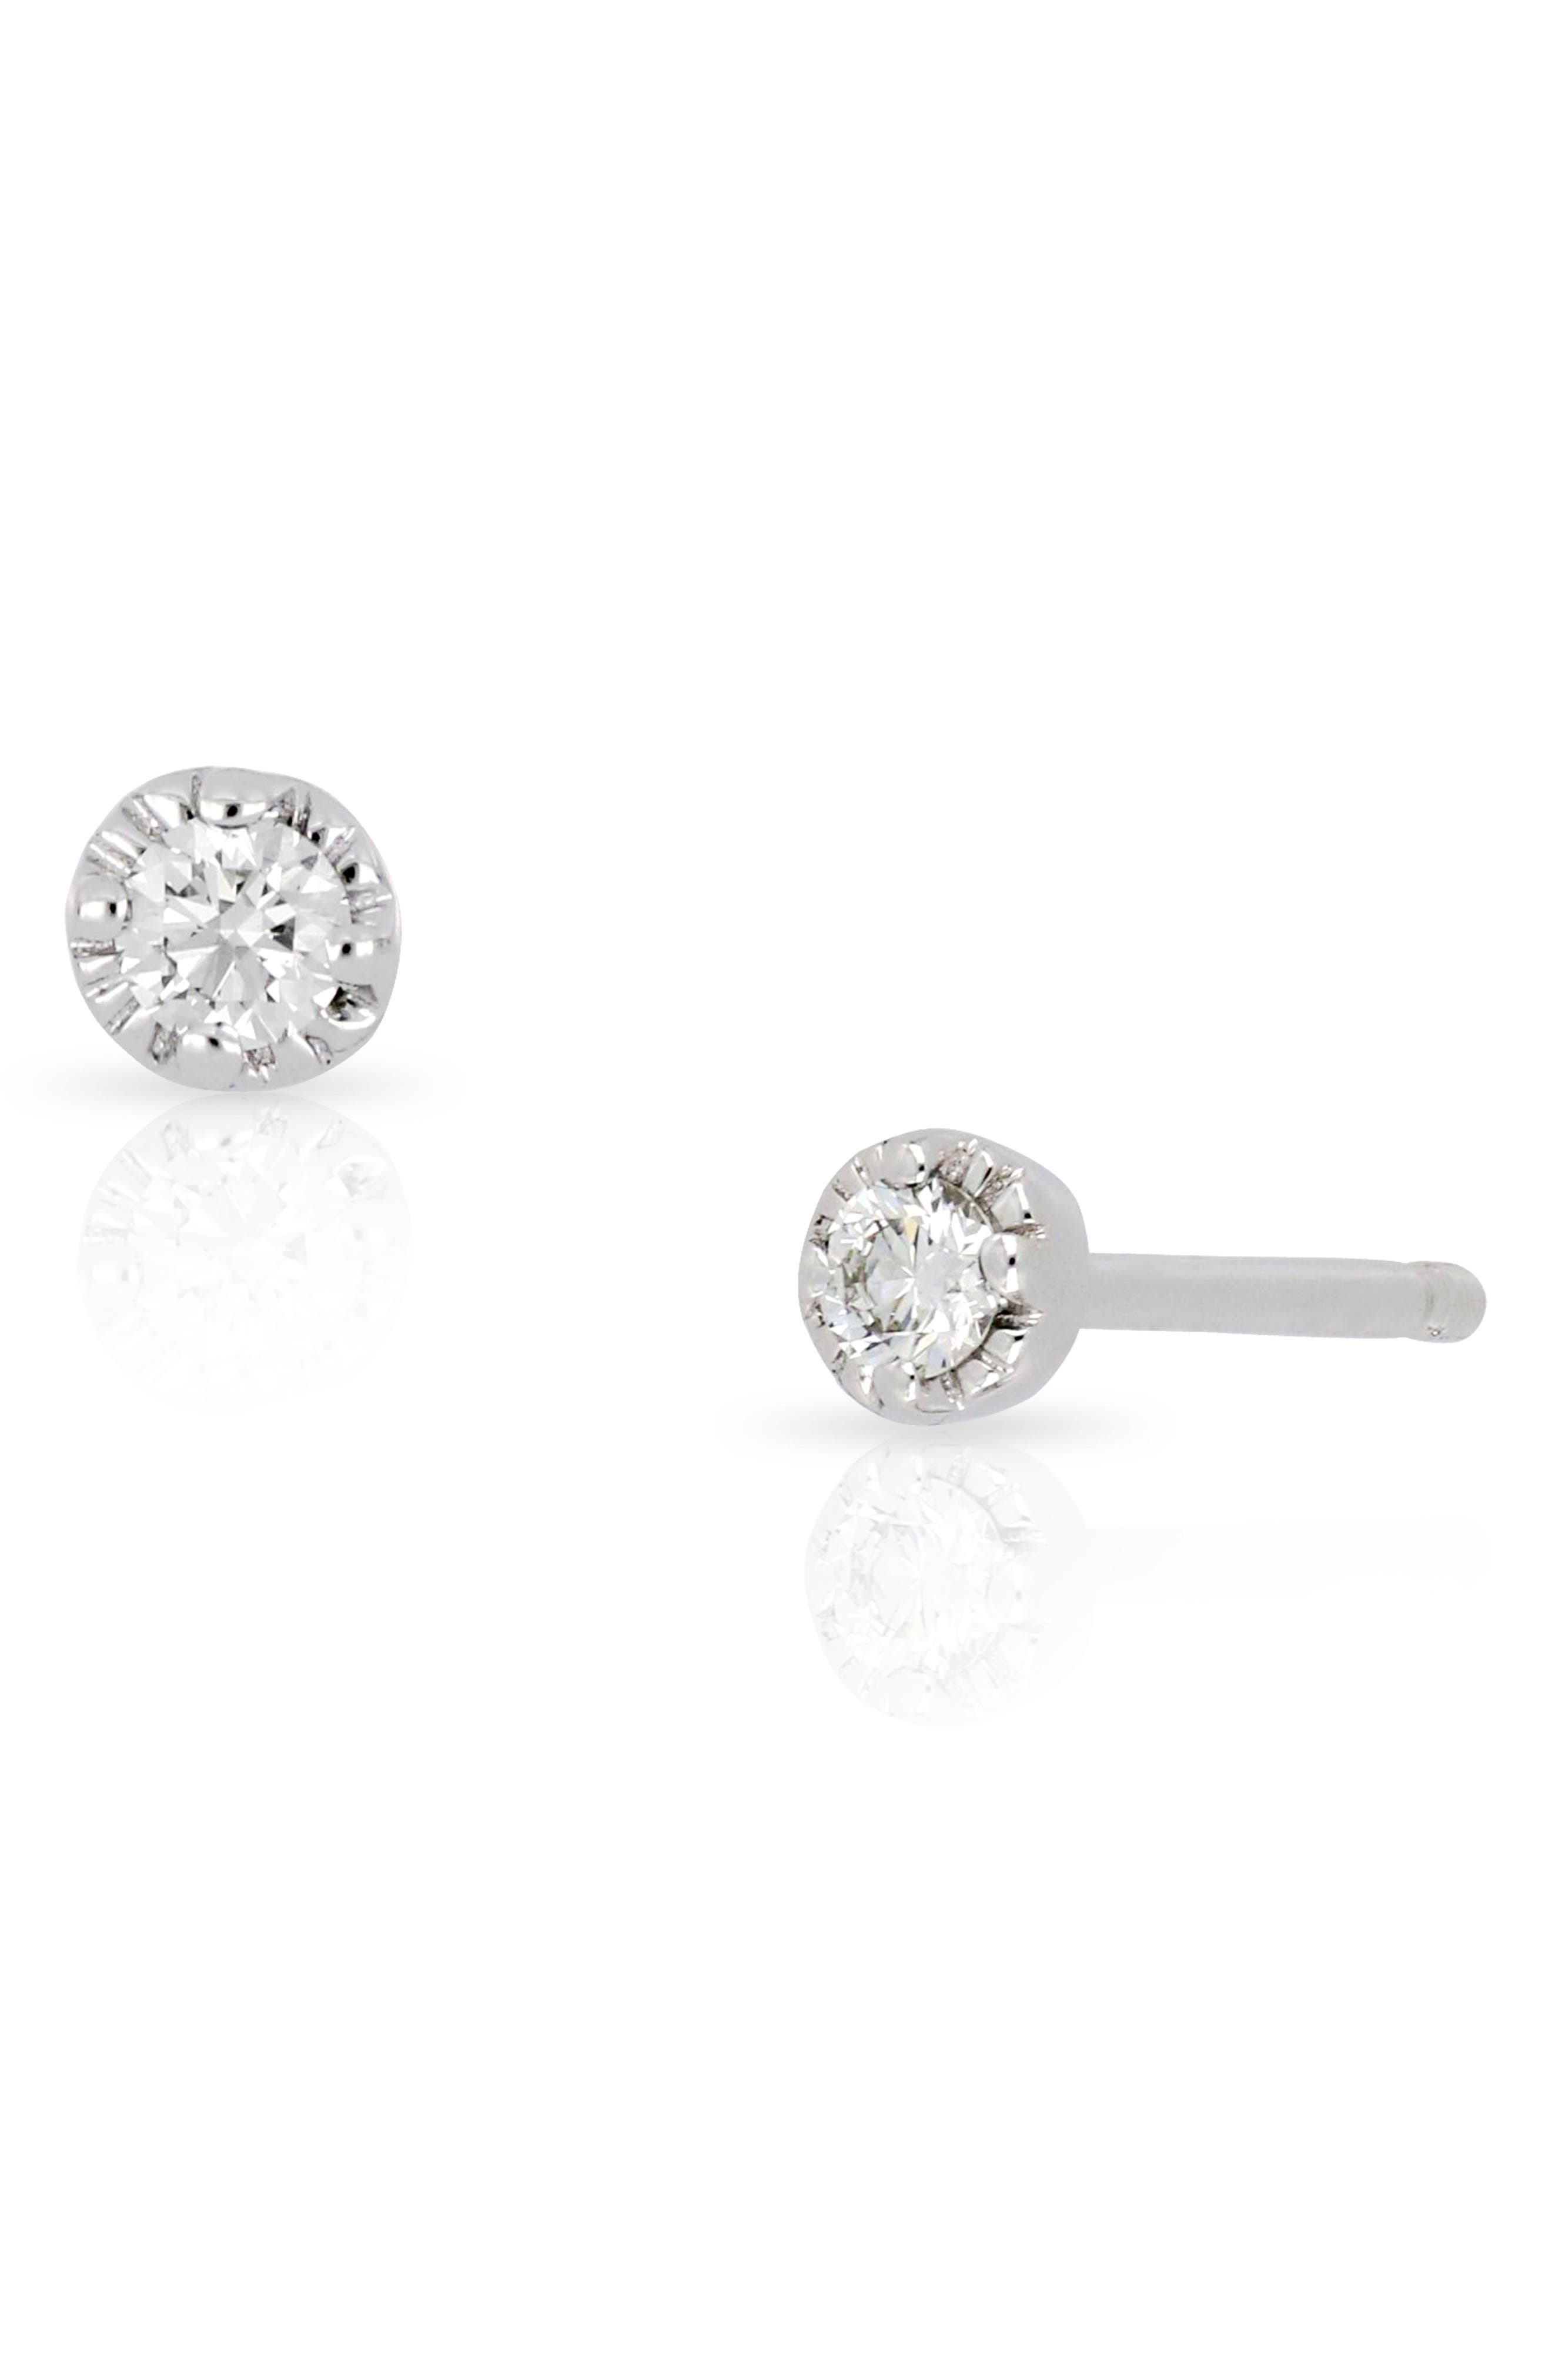 Mila Diamond Stud Earrings,                             Main thumbnail 1, color,                             WHITE GOLD